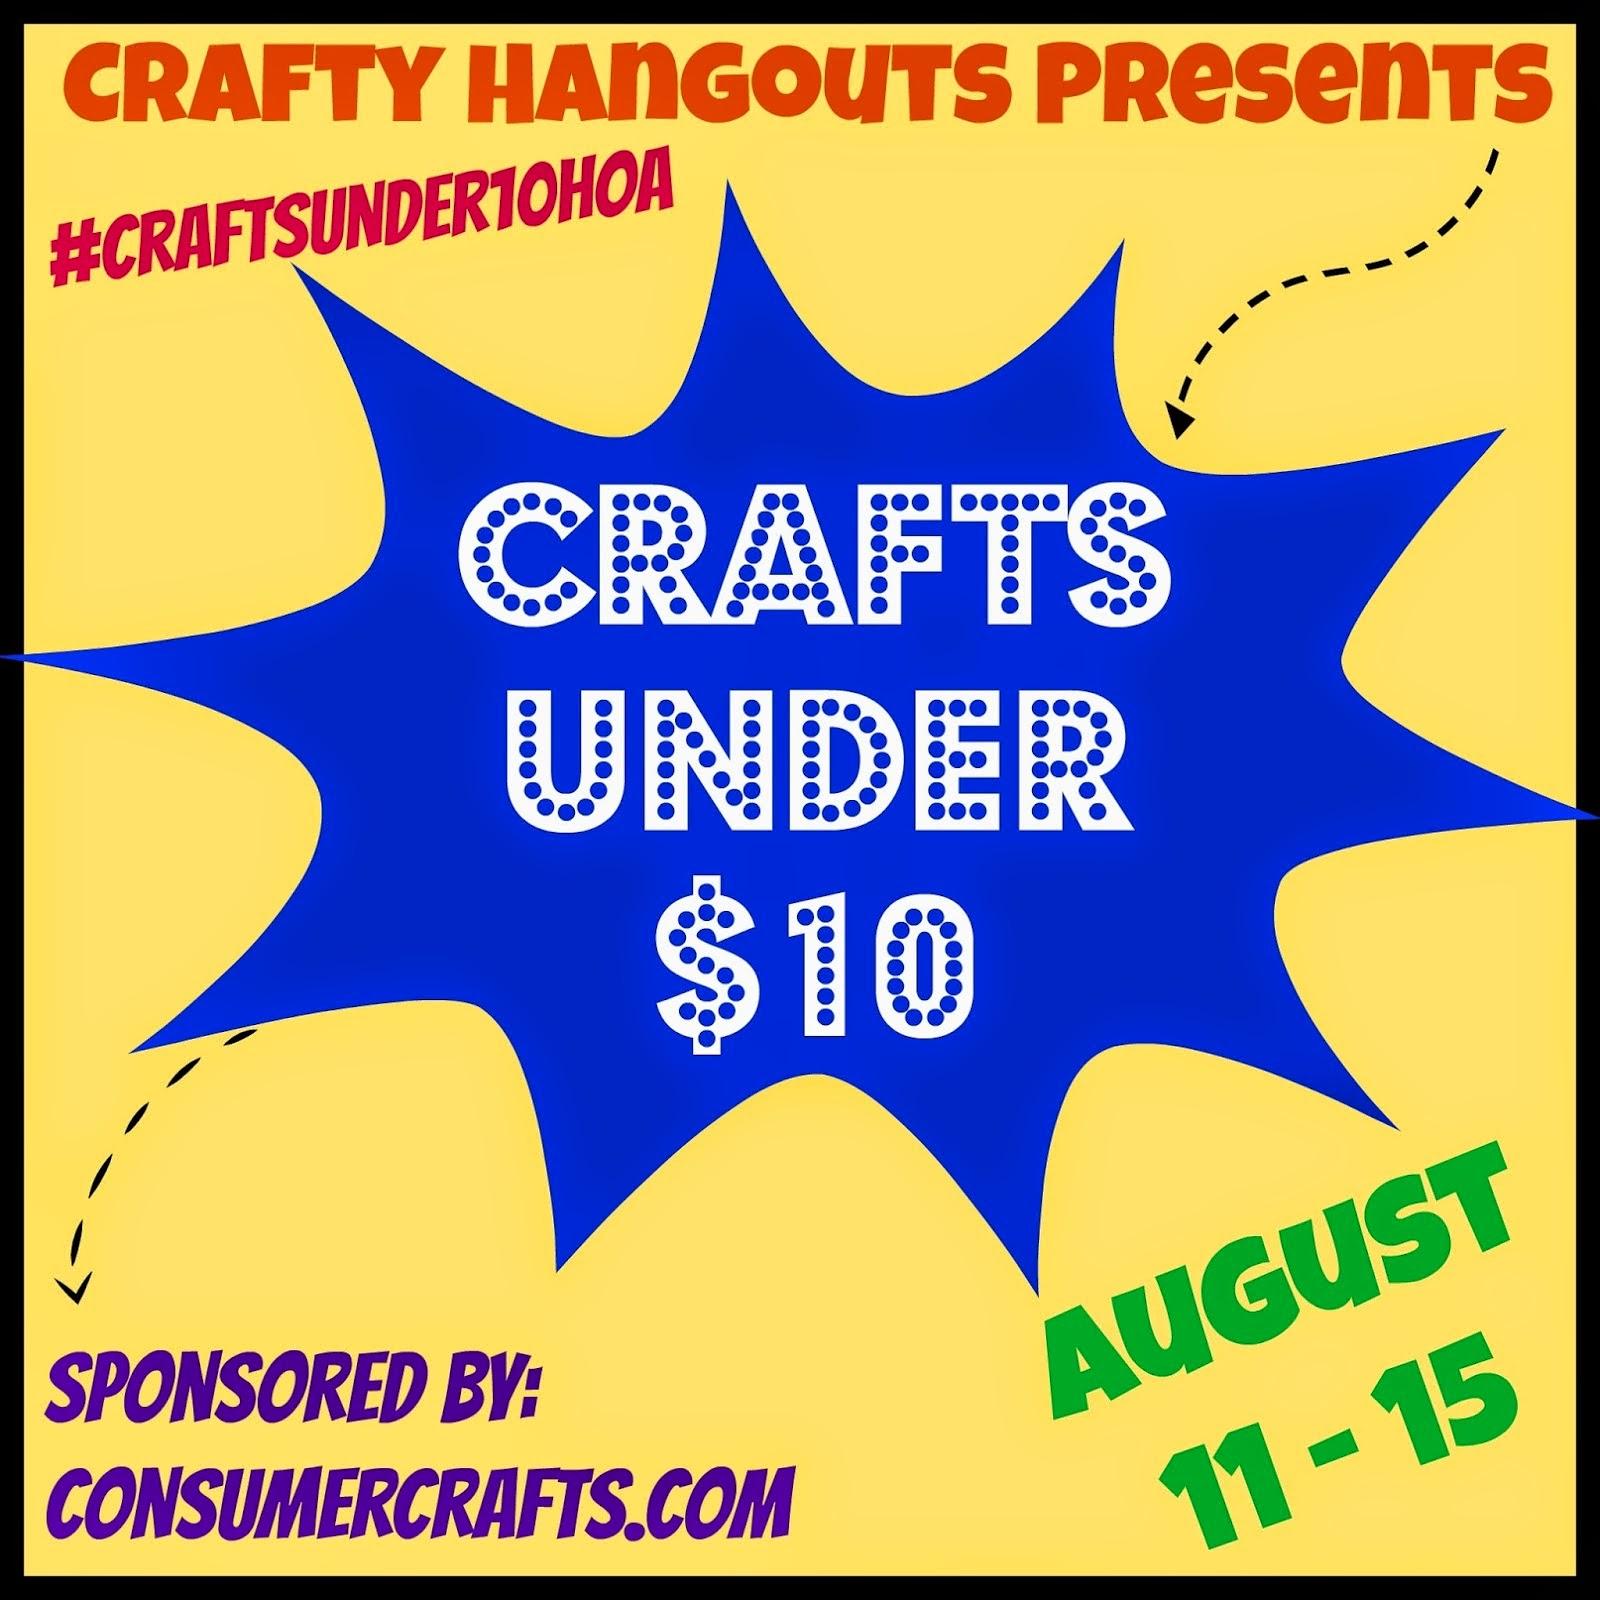 http://www.craftyhangouts.com/2014/08/crafts-under-10.html